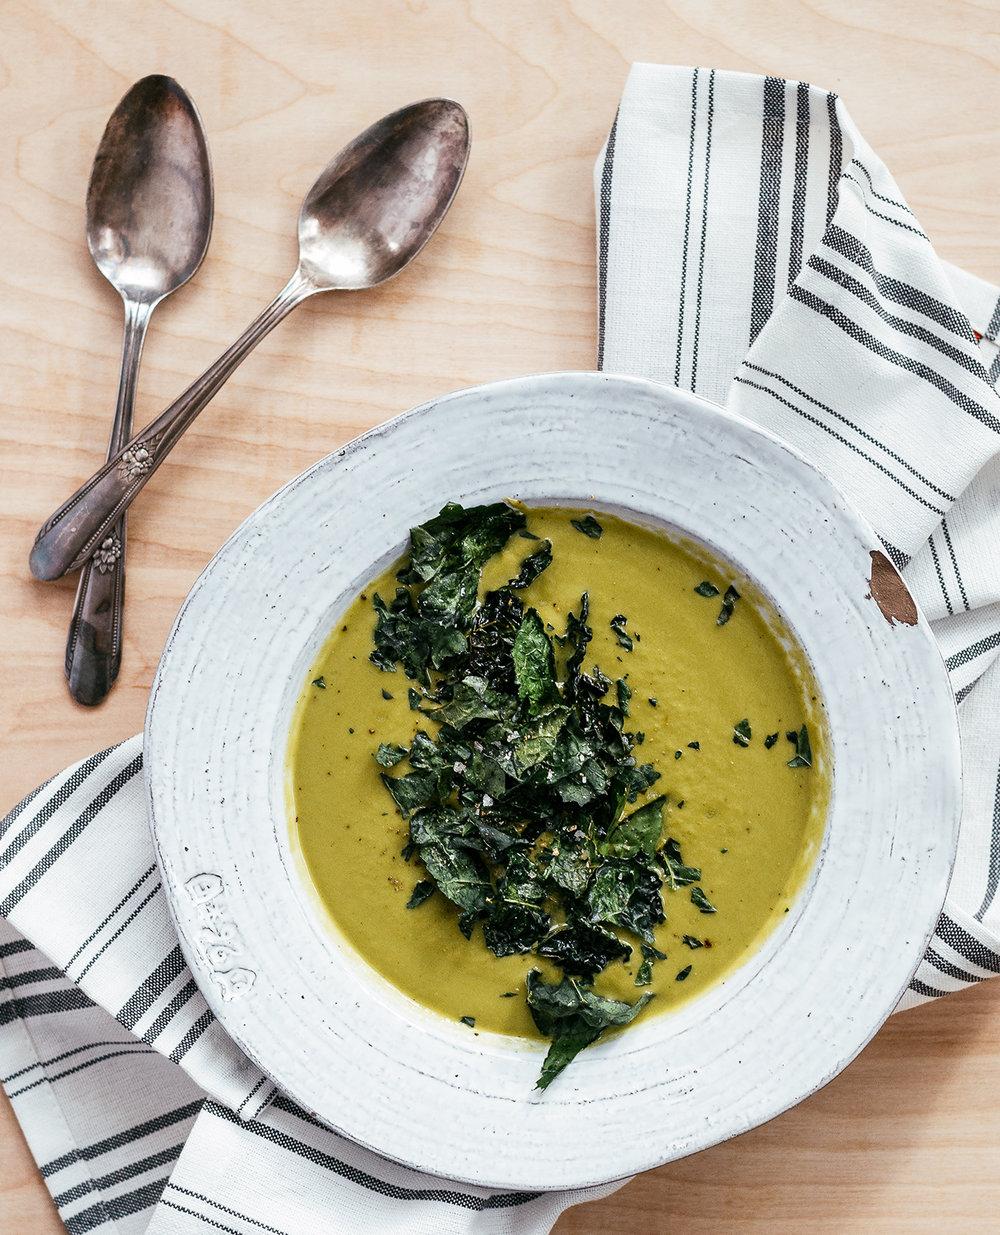 Cauliflower and Kale Soup